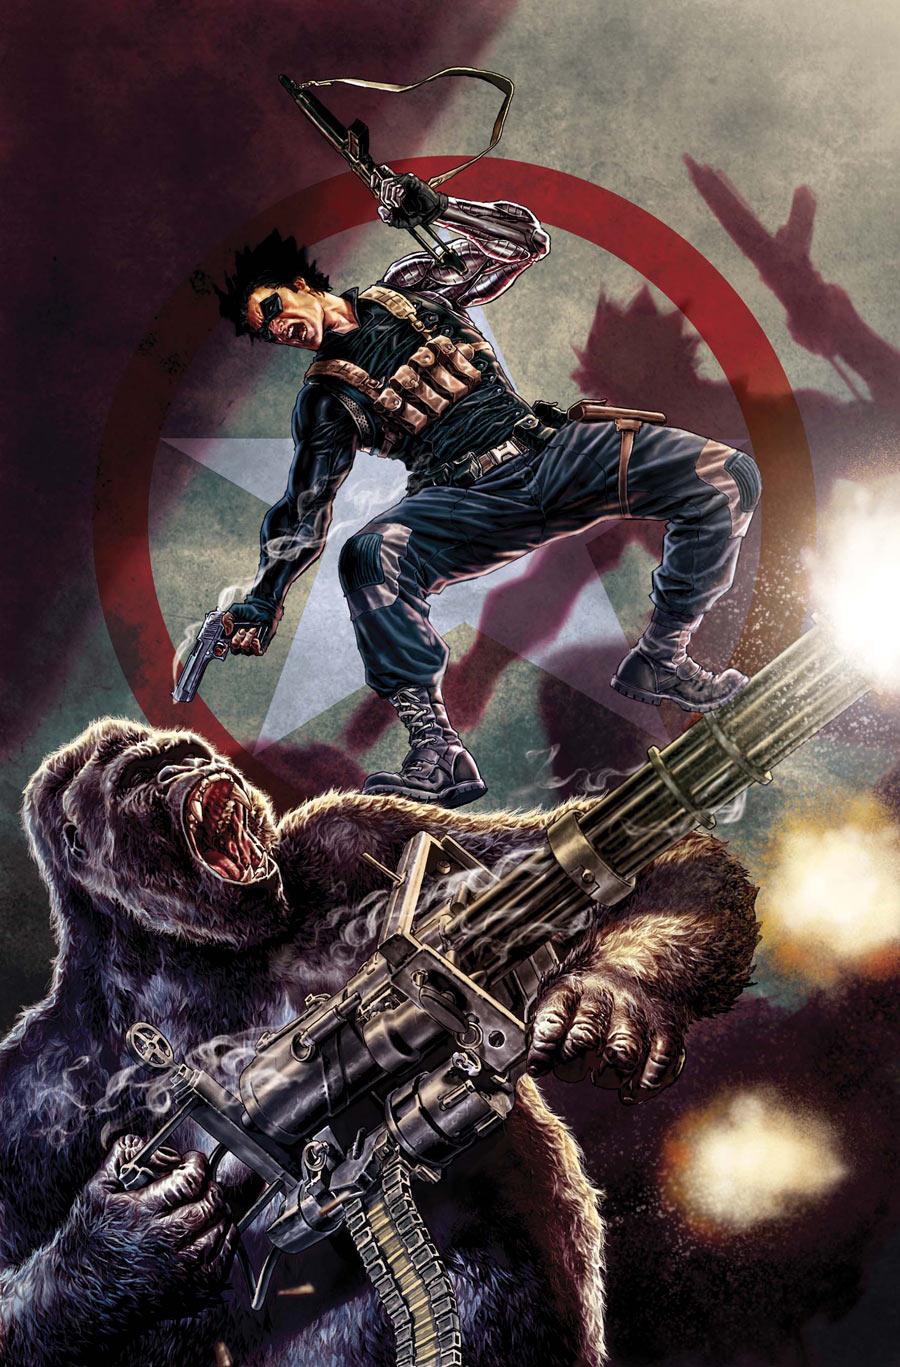 Winter Soldier #4 - Cover By Lee Bermejo